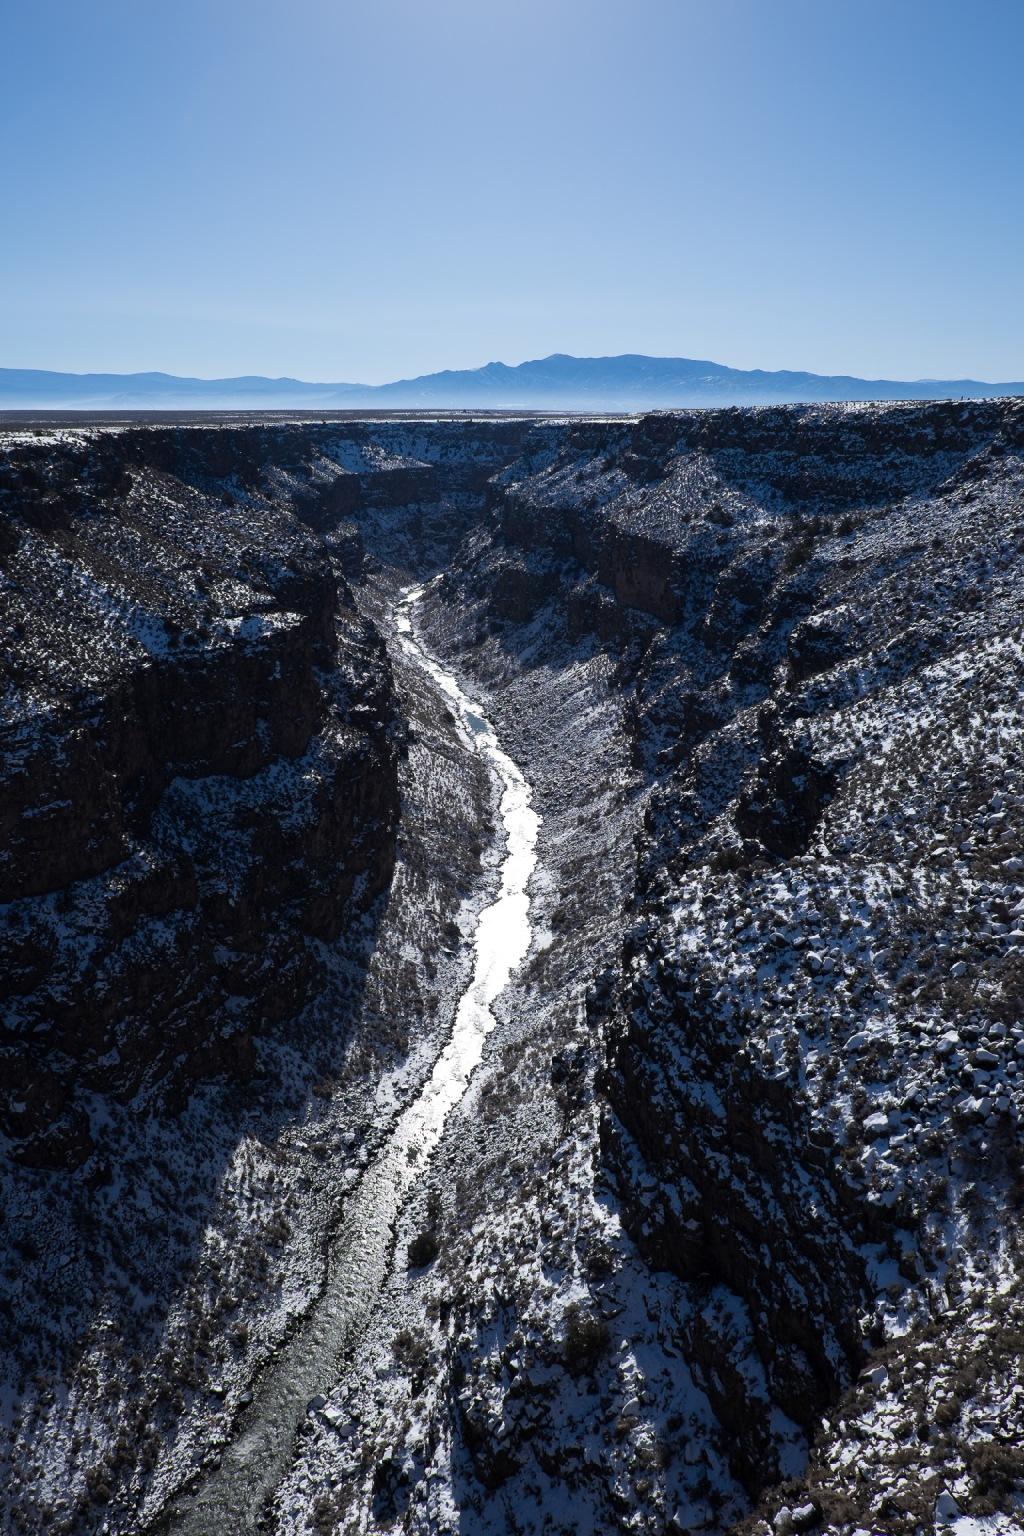 Rio Grande from Taos Bridge - Fujifilm X-T1